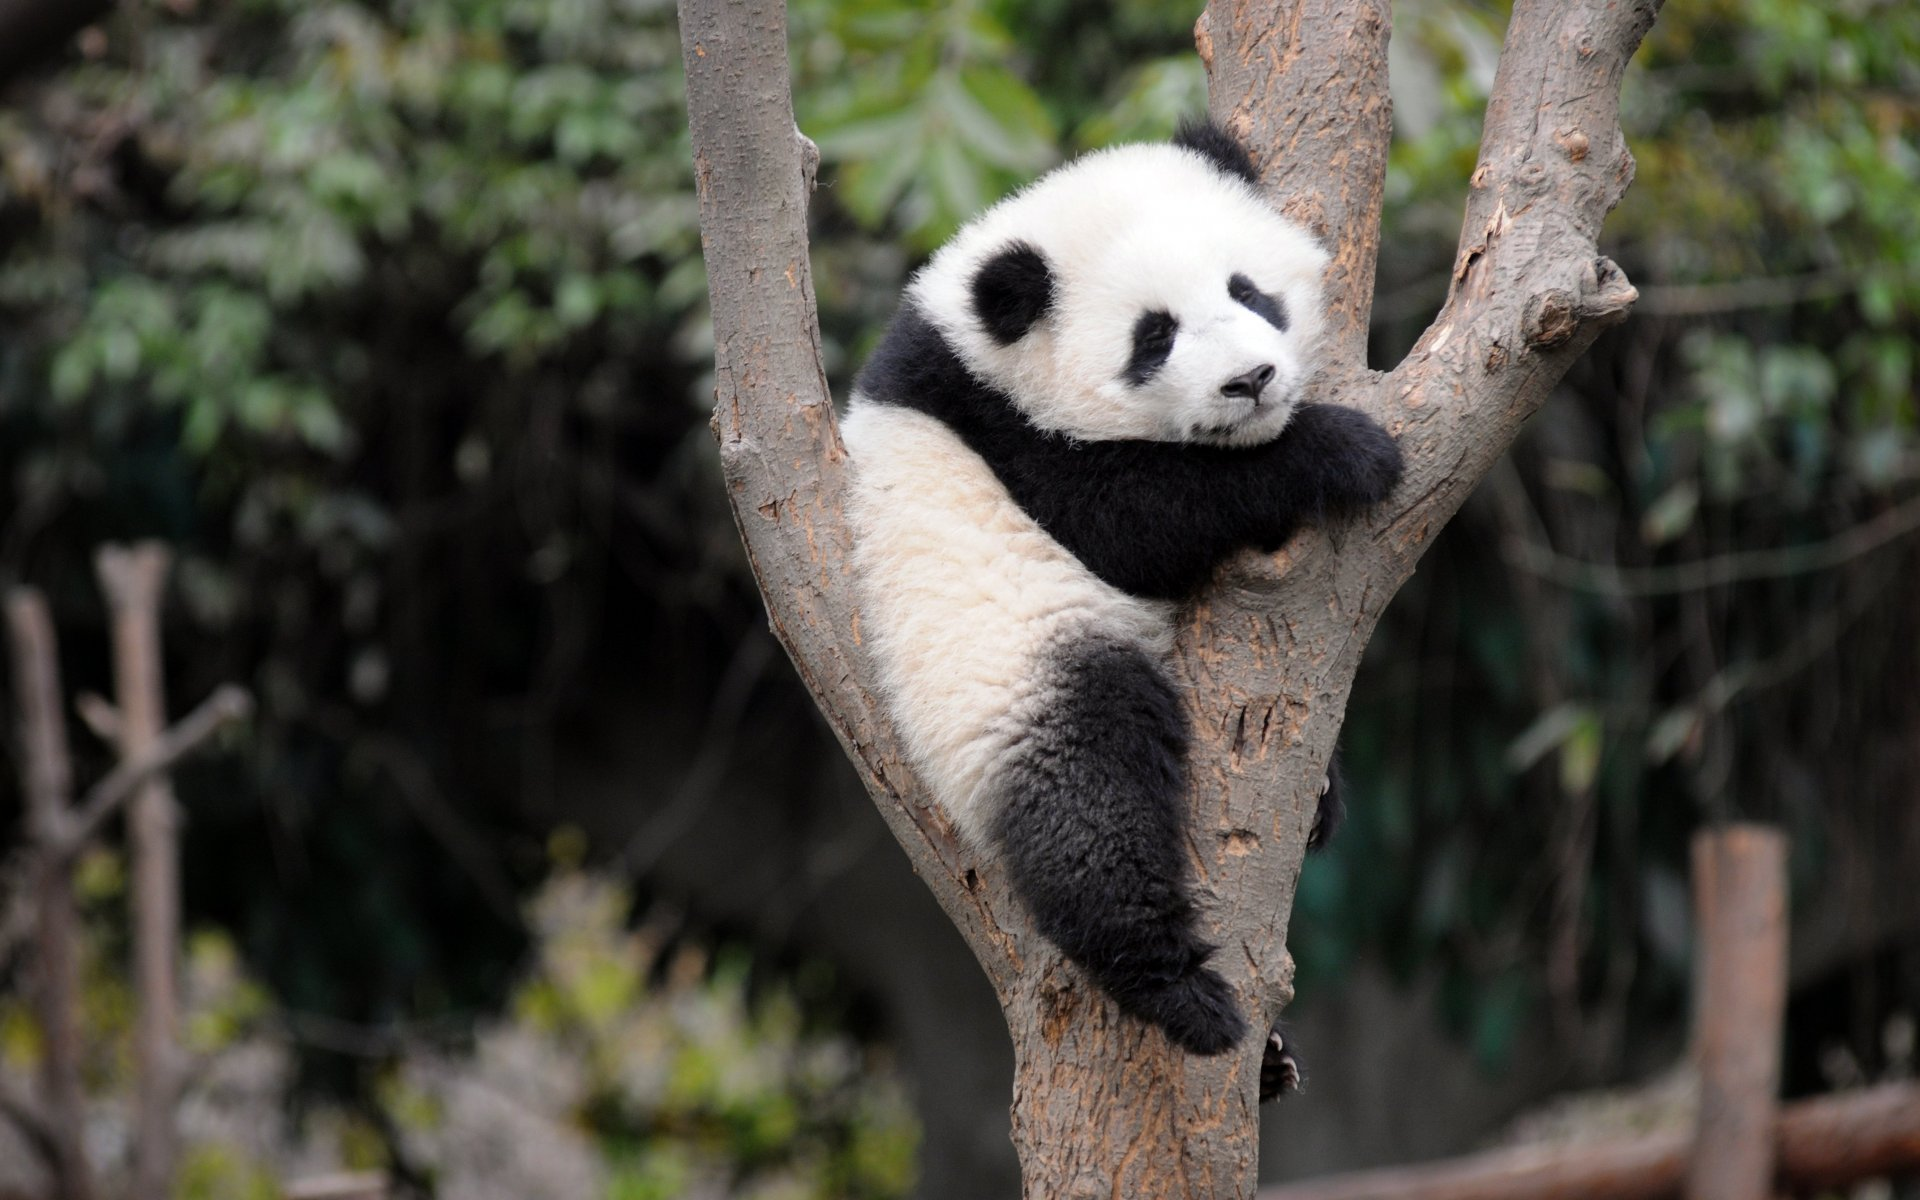 cute-giant-panda-playing-tree-panda-bear-animals-bamboo-china-1920x1200[1]